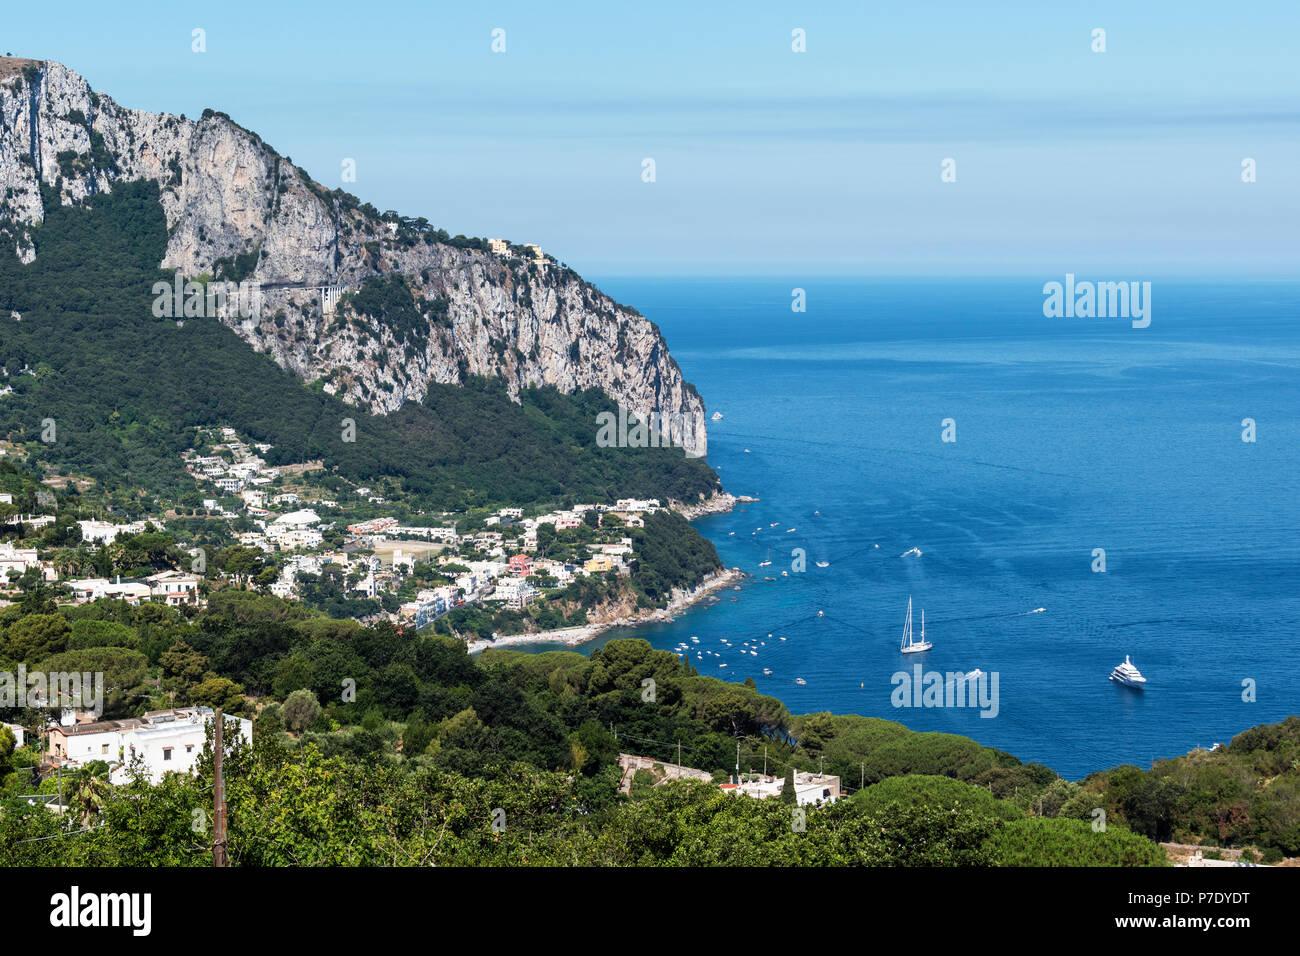 the island of capri, tyrrhenian sea, gulf of naples, campania, italy. - Stock Image